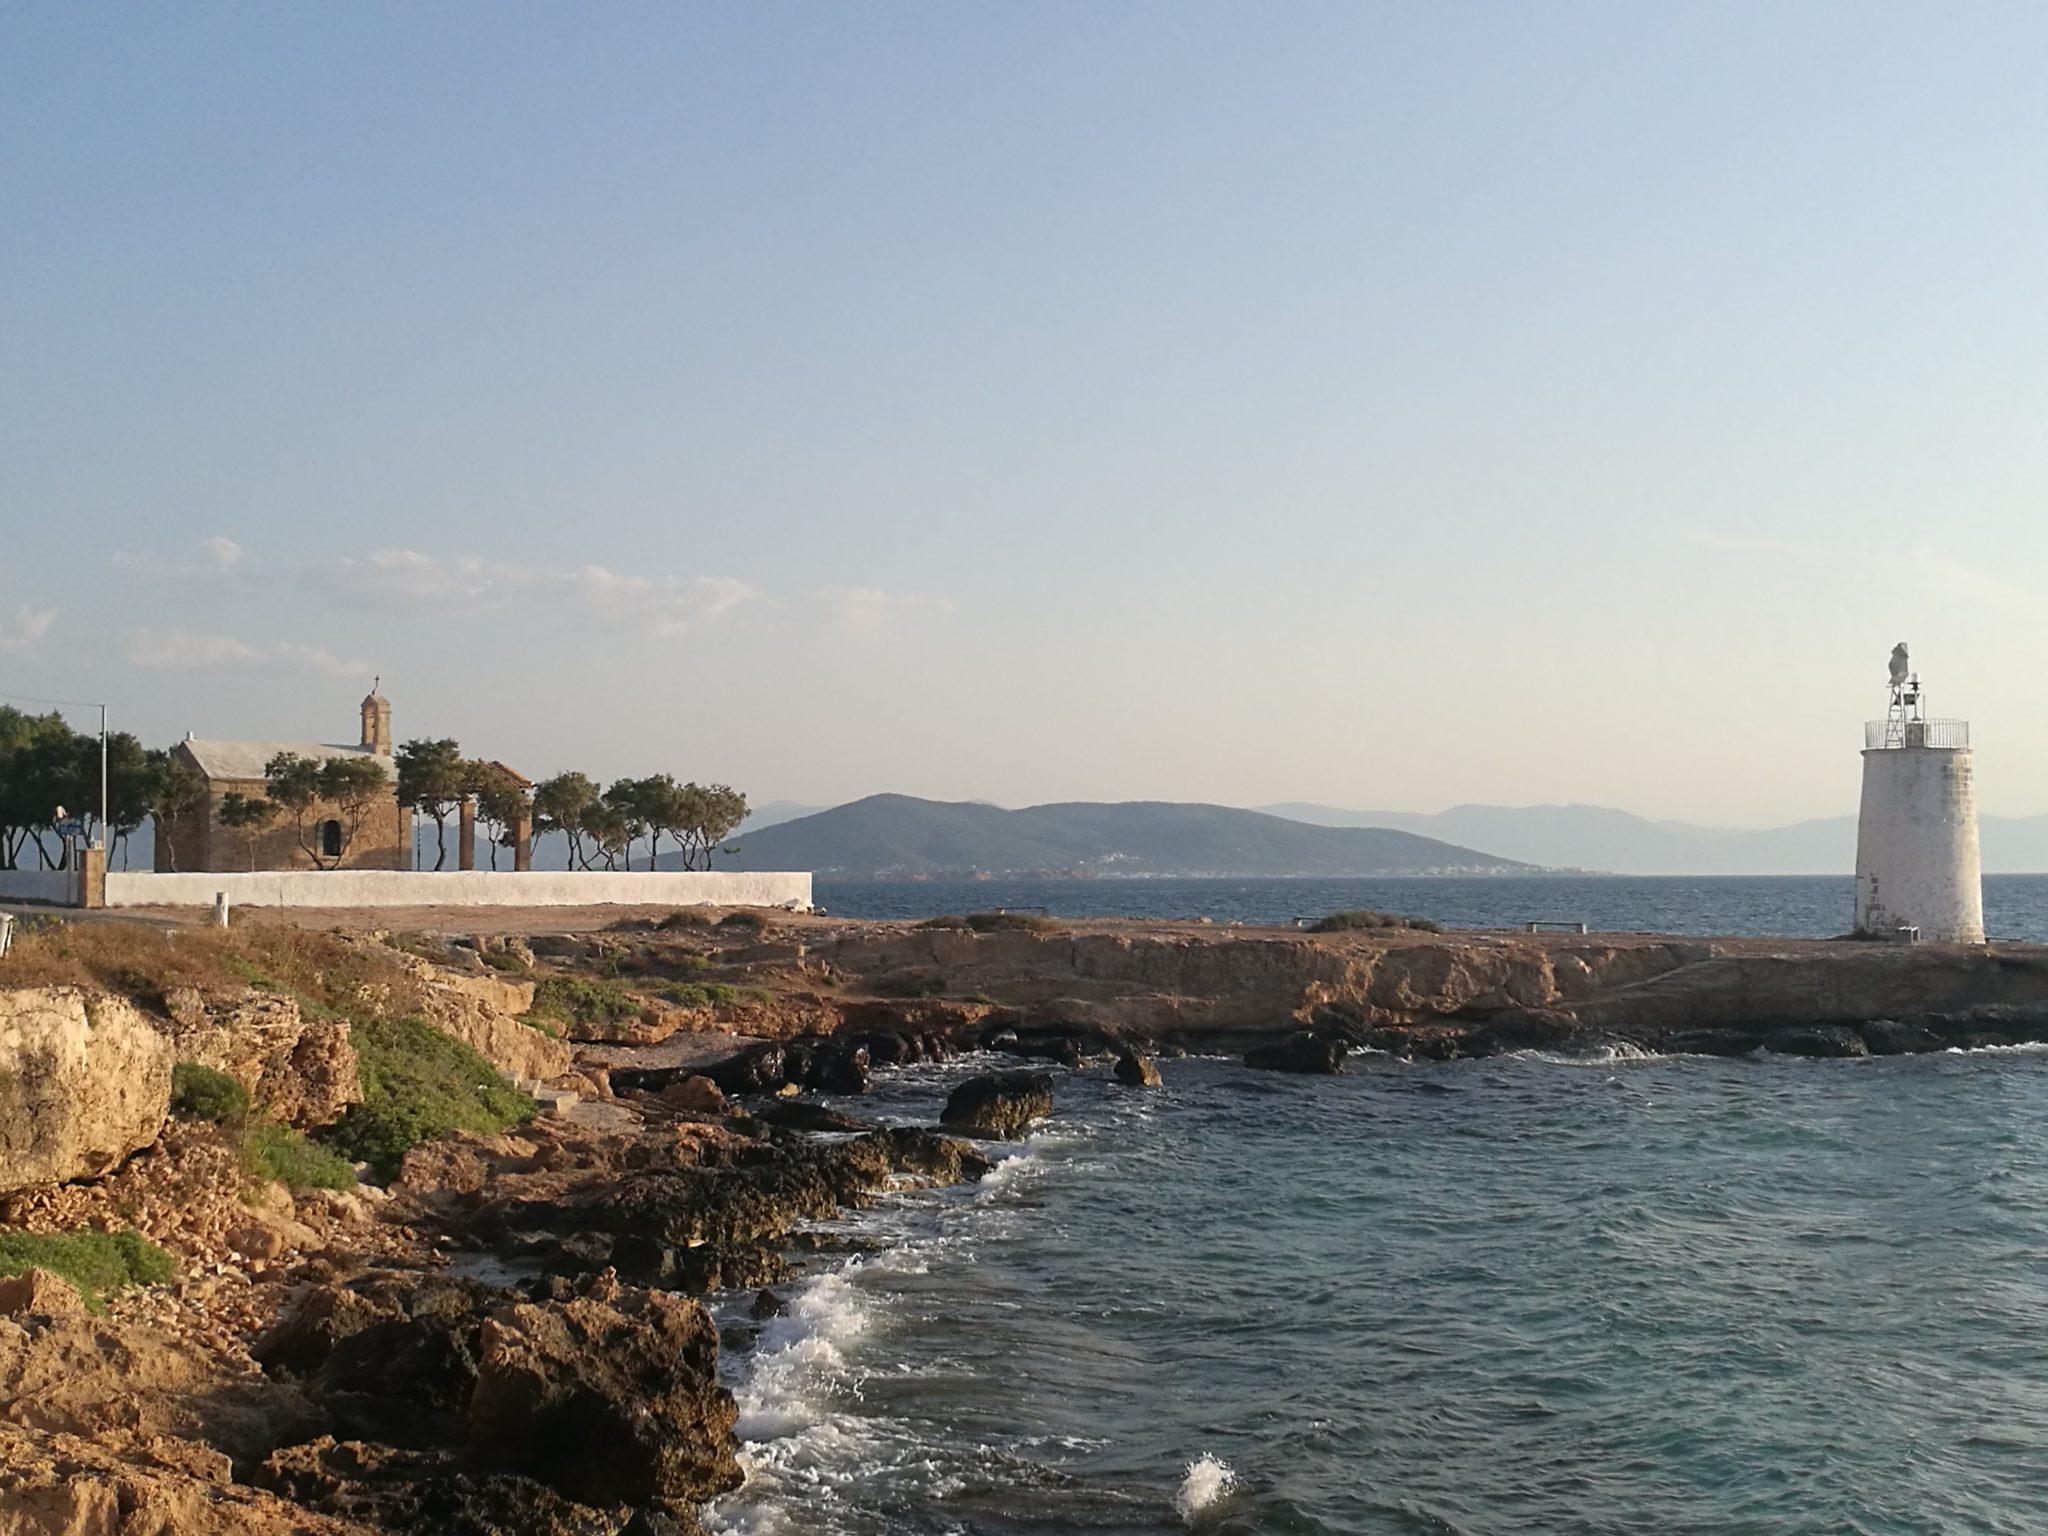 Grecka wyspa Egina - nadmorska cerkiew